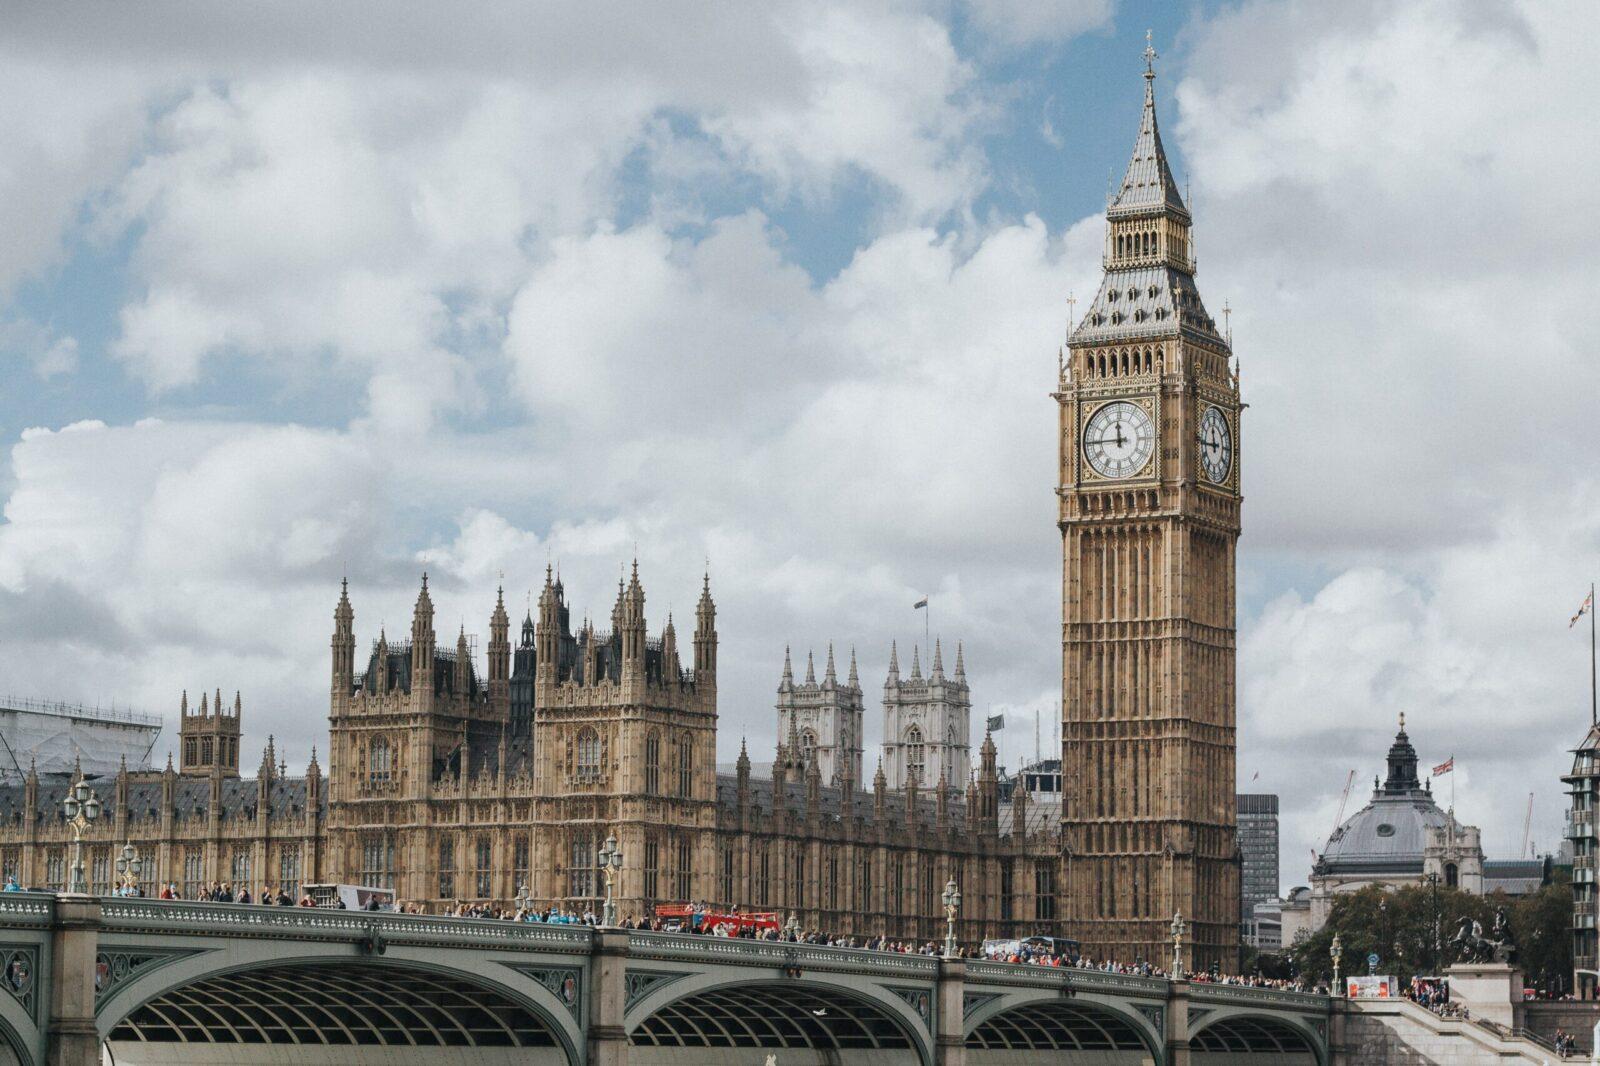 marcin nowak ixqtqc f6ji unsplash 1 scaled - Как Brexit повлияет на экономику Англии?